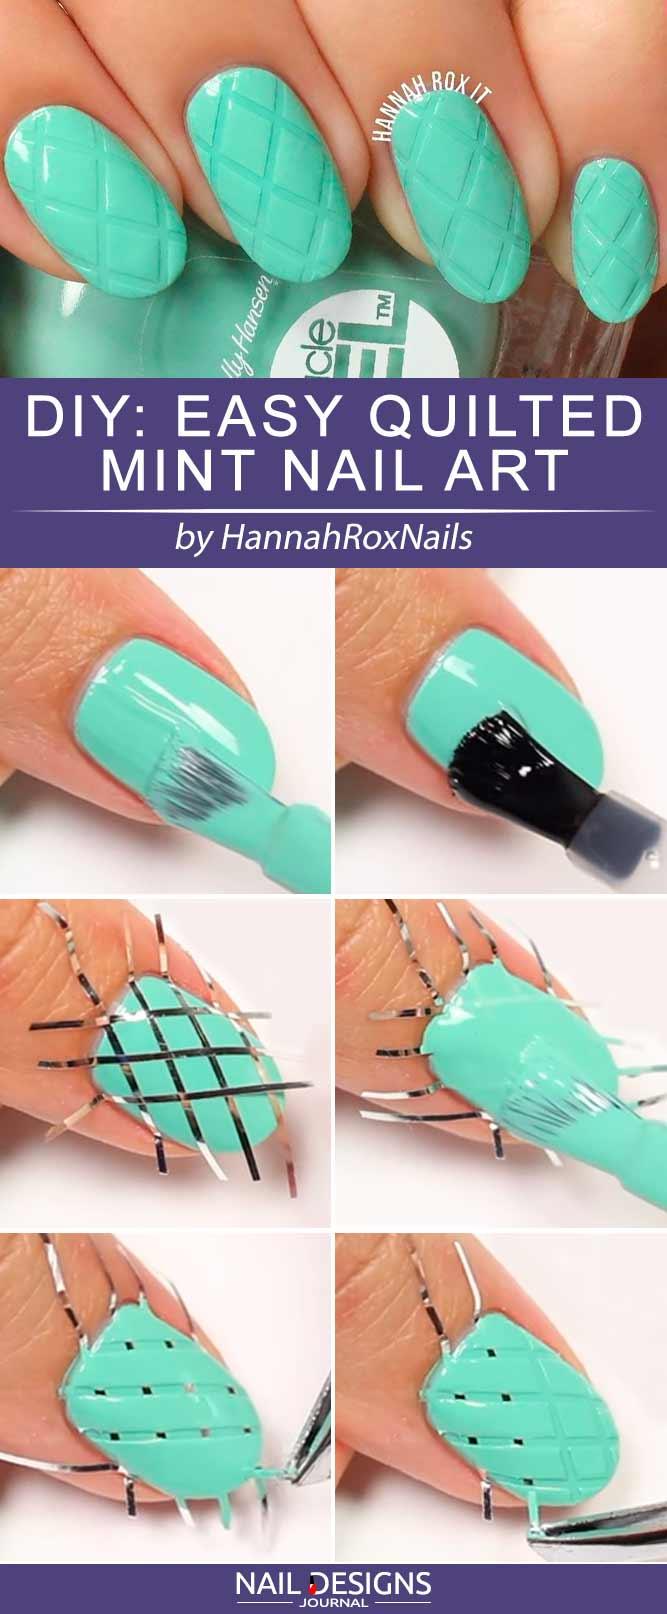 20 Cute Nails Designs Ideas Not To Miss | NailDesignsJournal.com